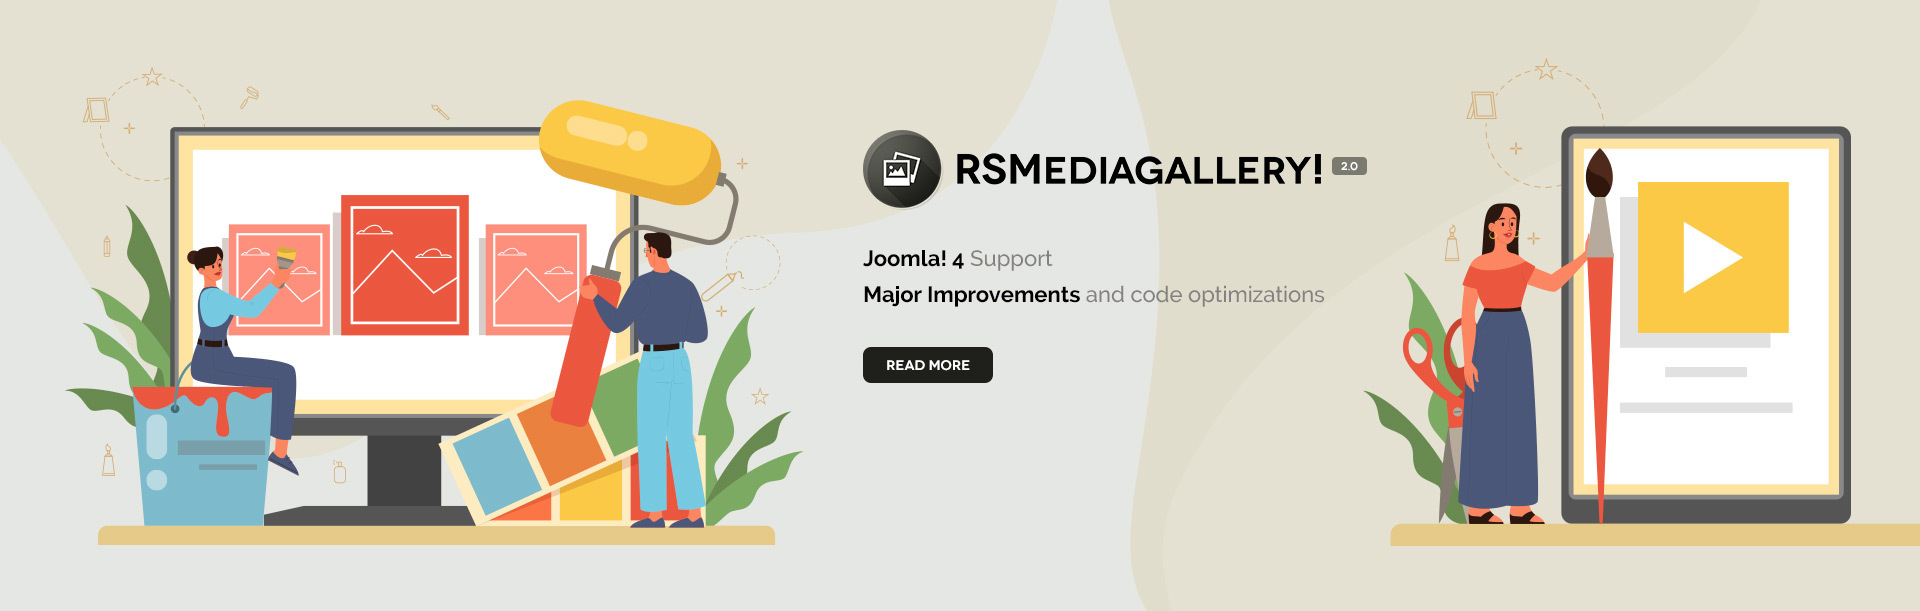 RSMediaGallery! Joomla! 4 support